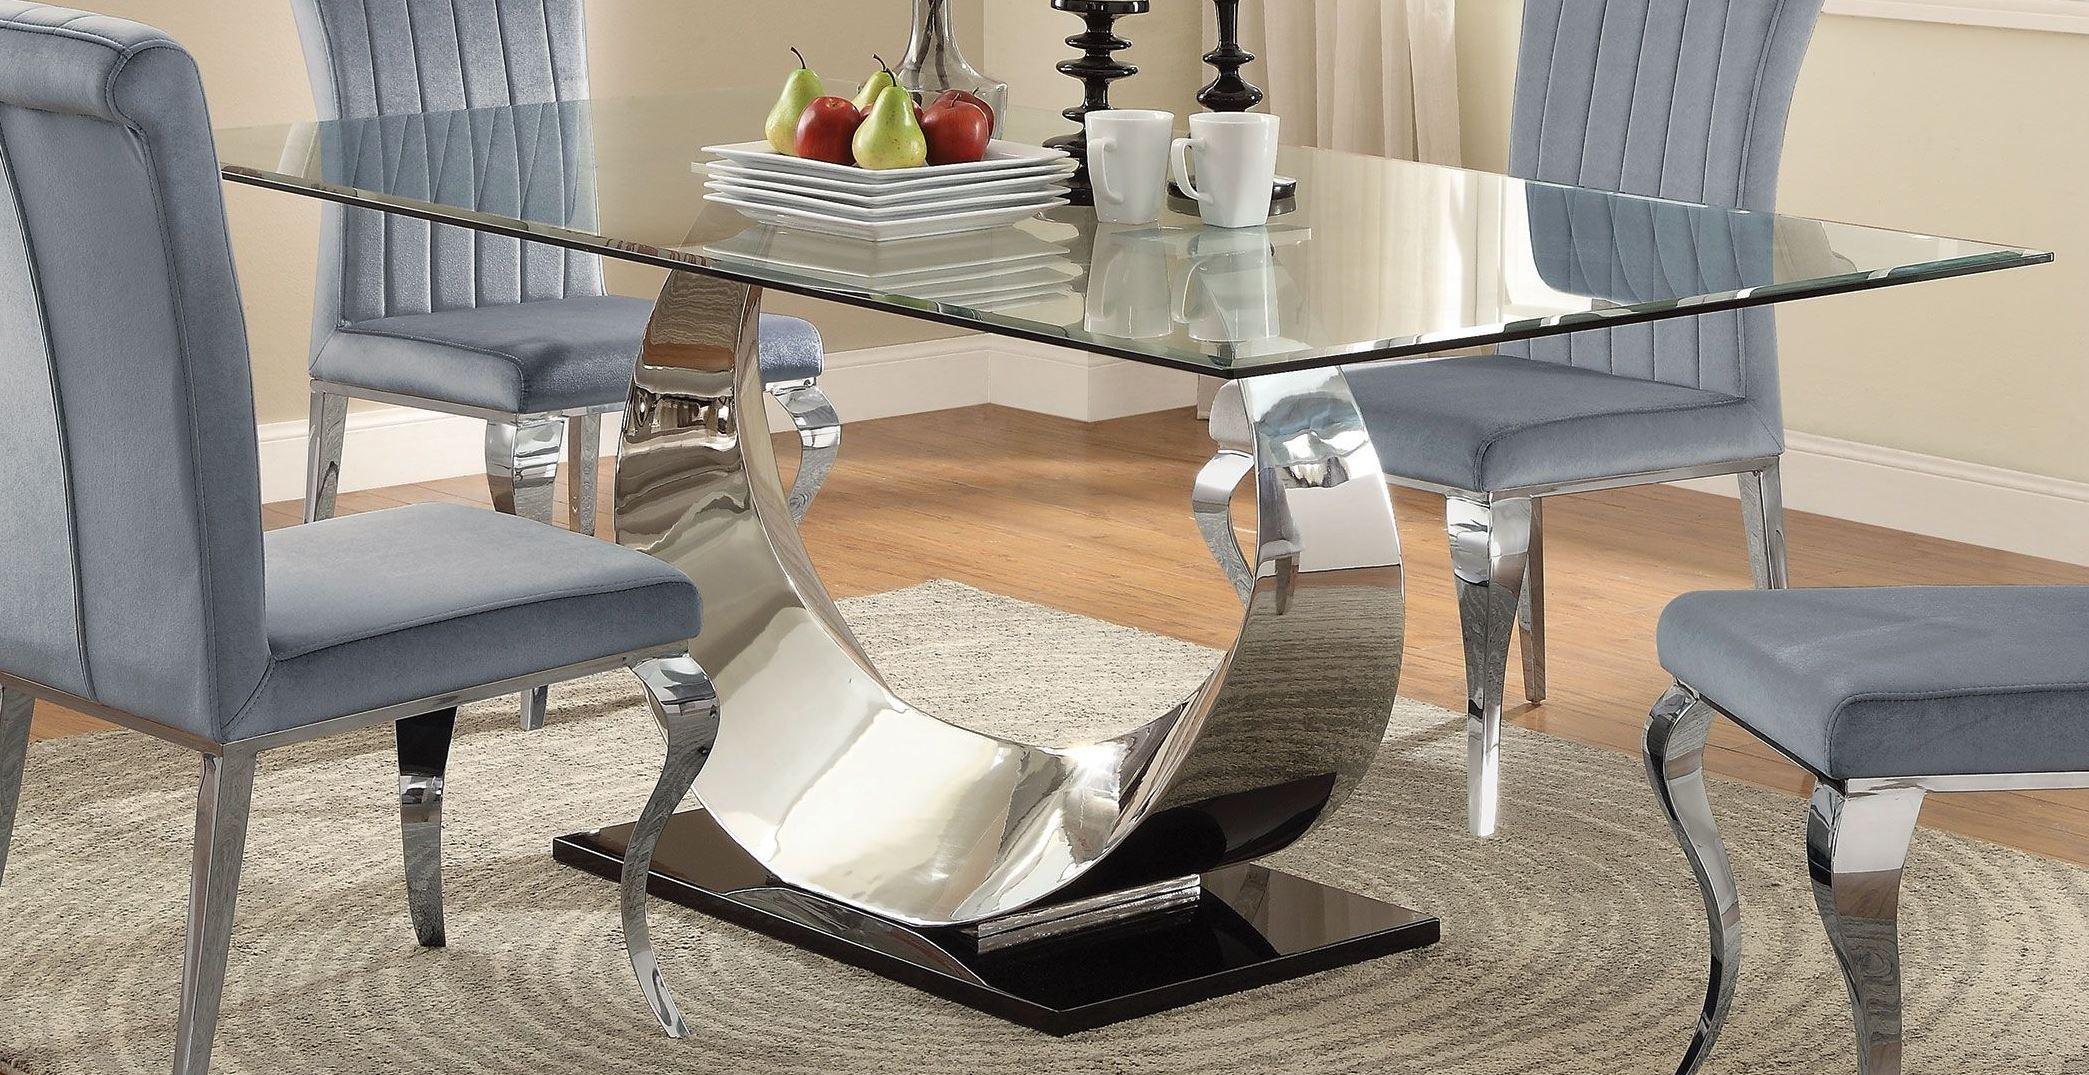 manessier chrome dining room set 107051 coaster furniture